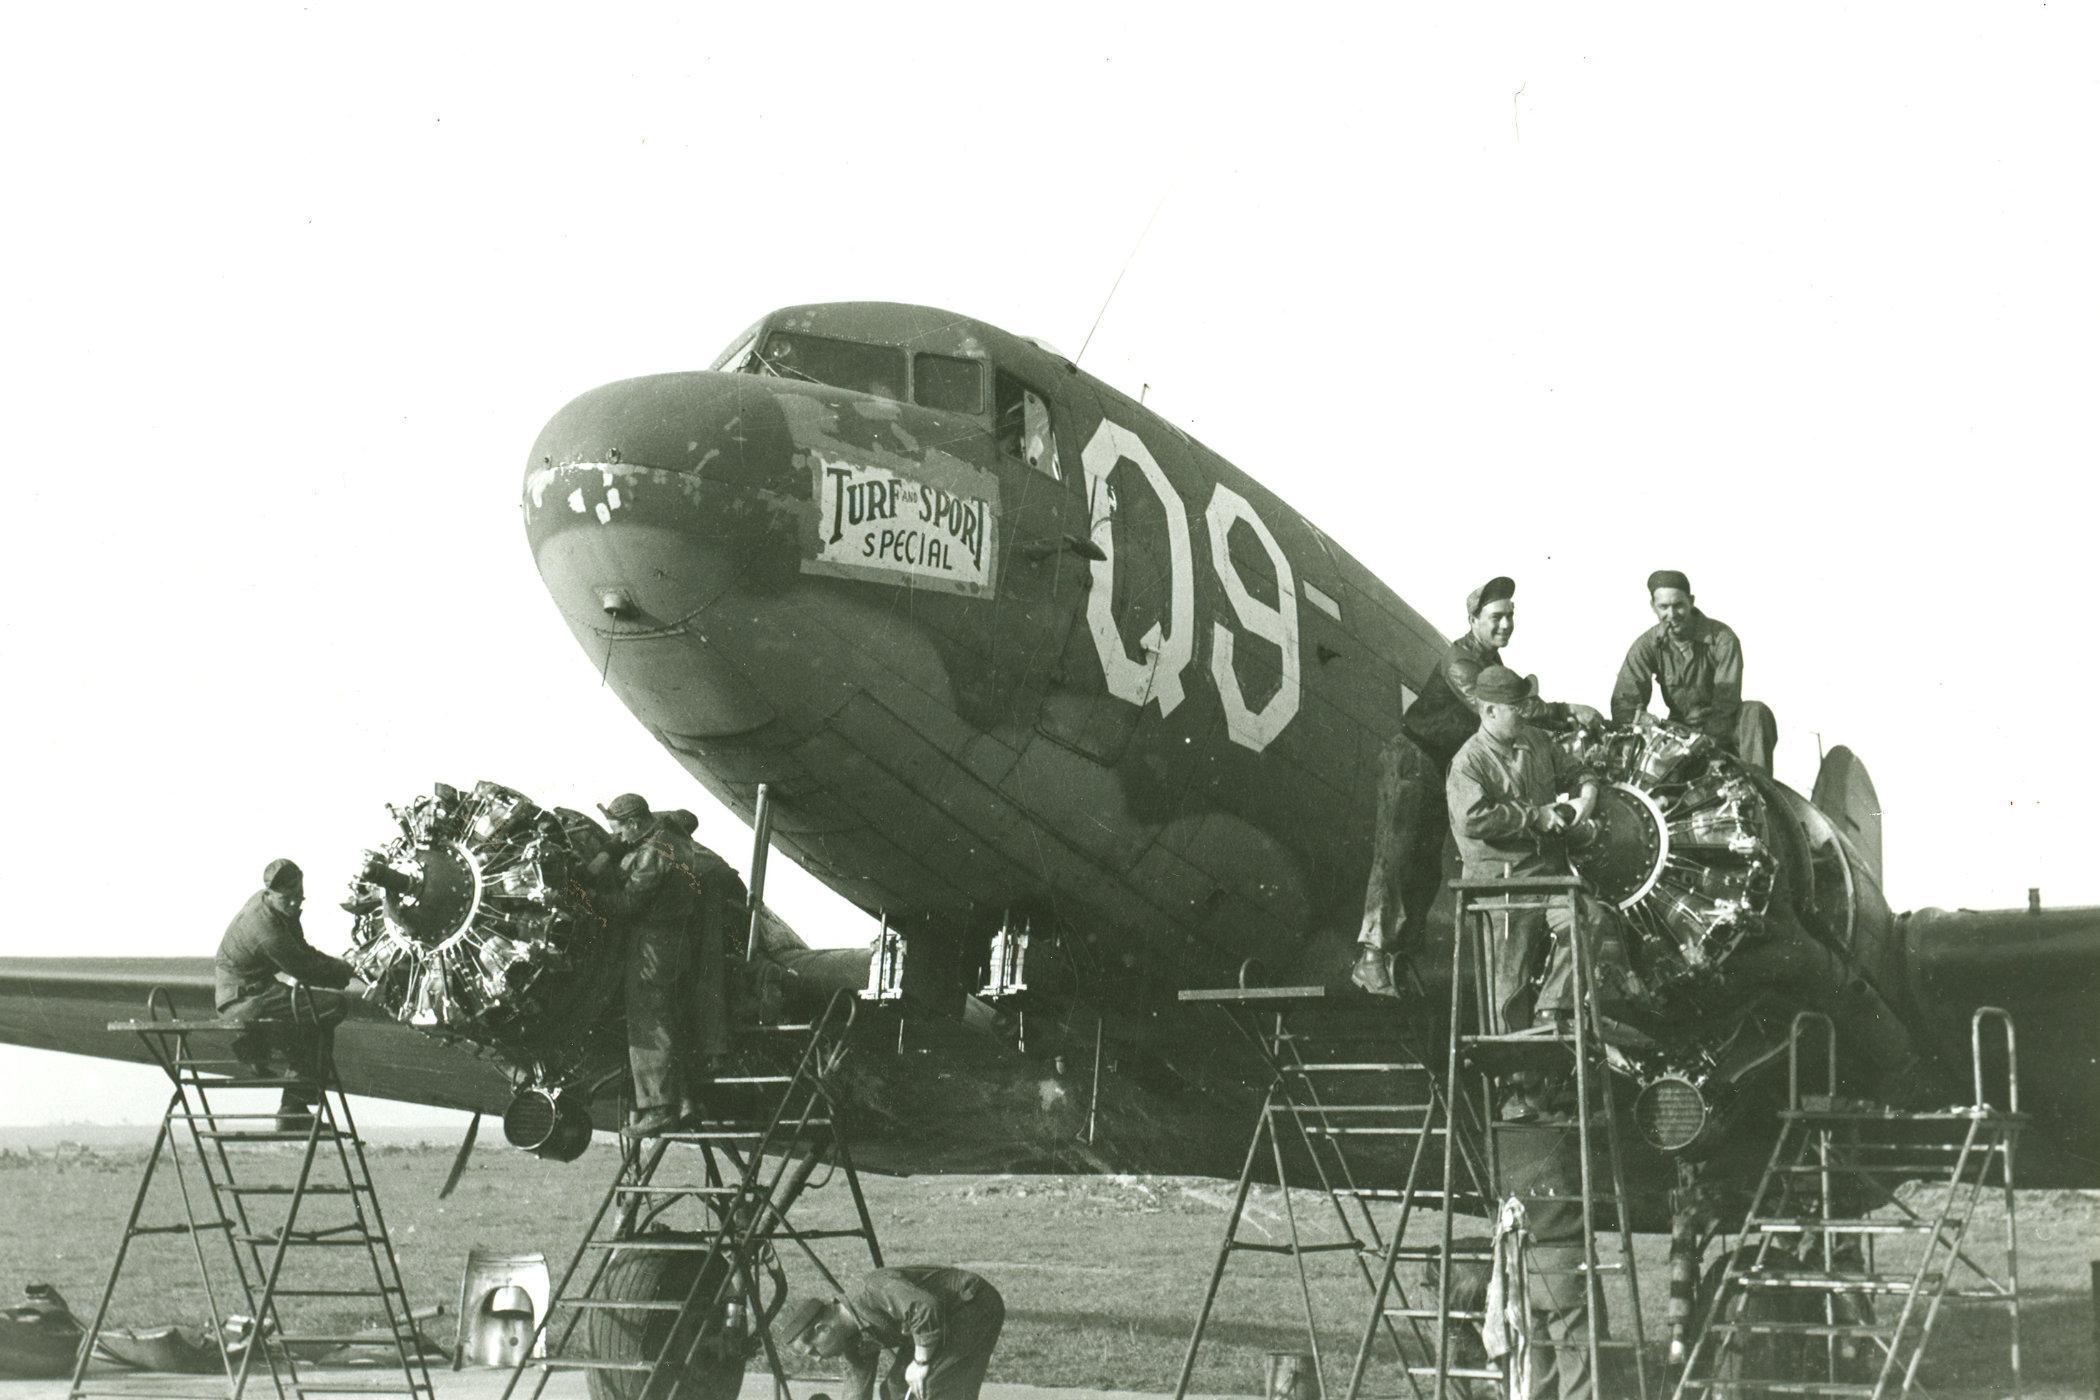 McDonnell Douglas C-47 Skytrain, using 4 Pratt & Whitney R-1830-90C 14-cylinder radial engines.